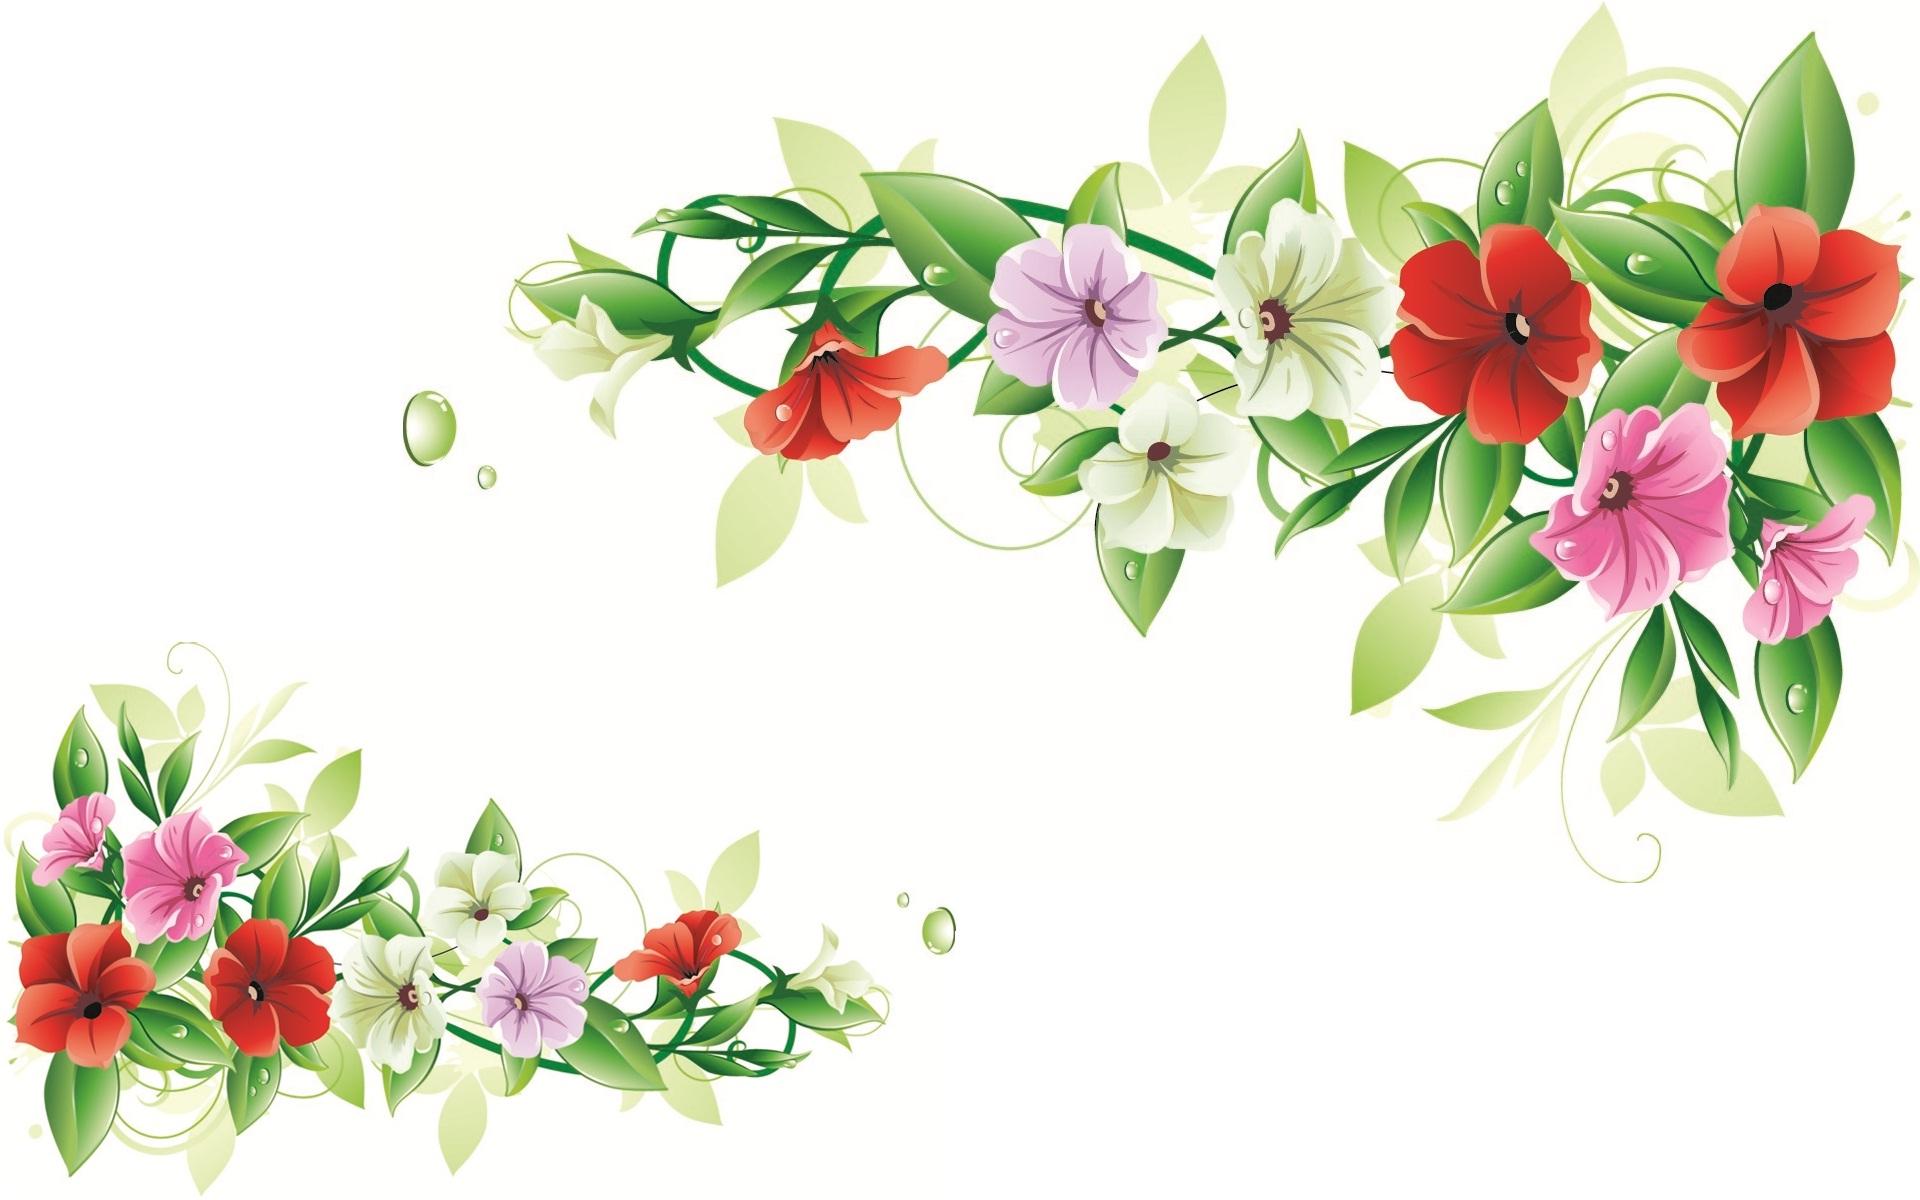 Flowers design frame set HD Wallpapers Rocks 1920x1200